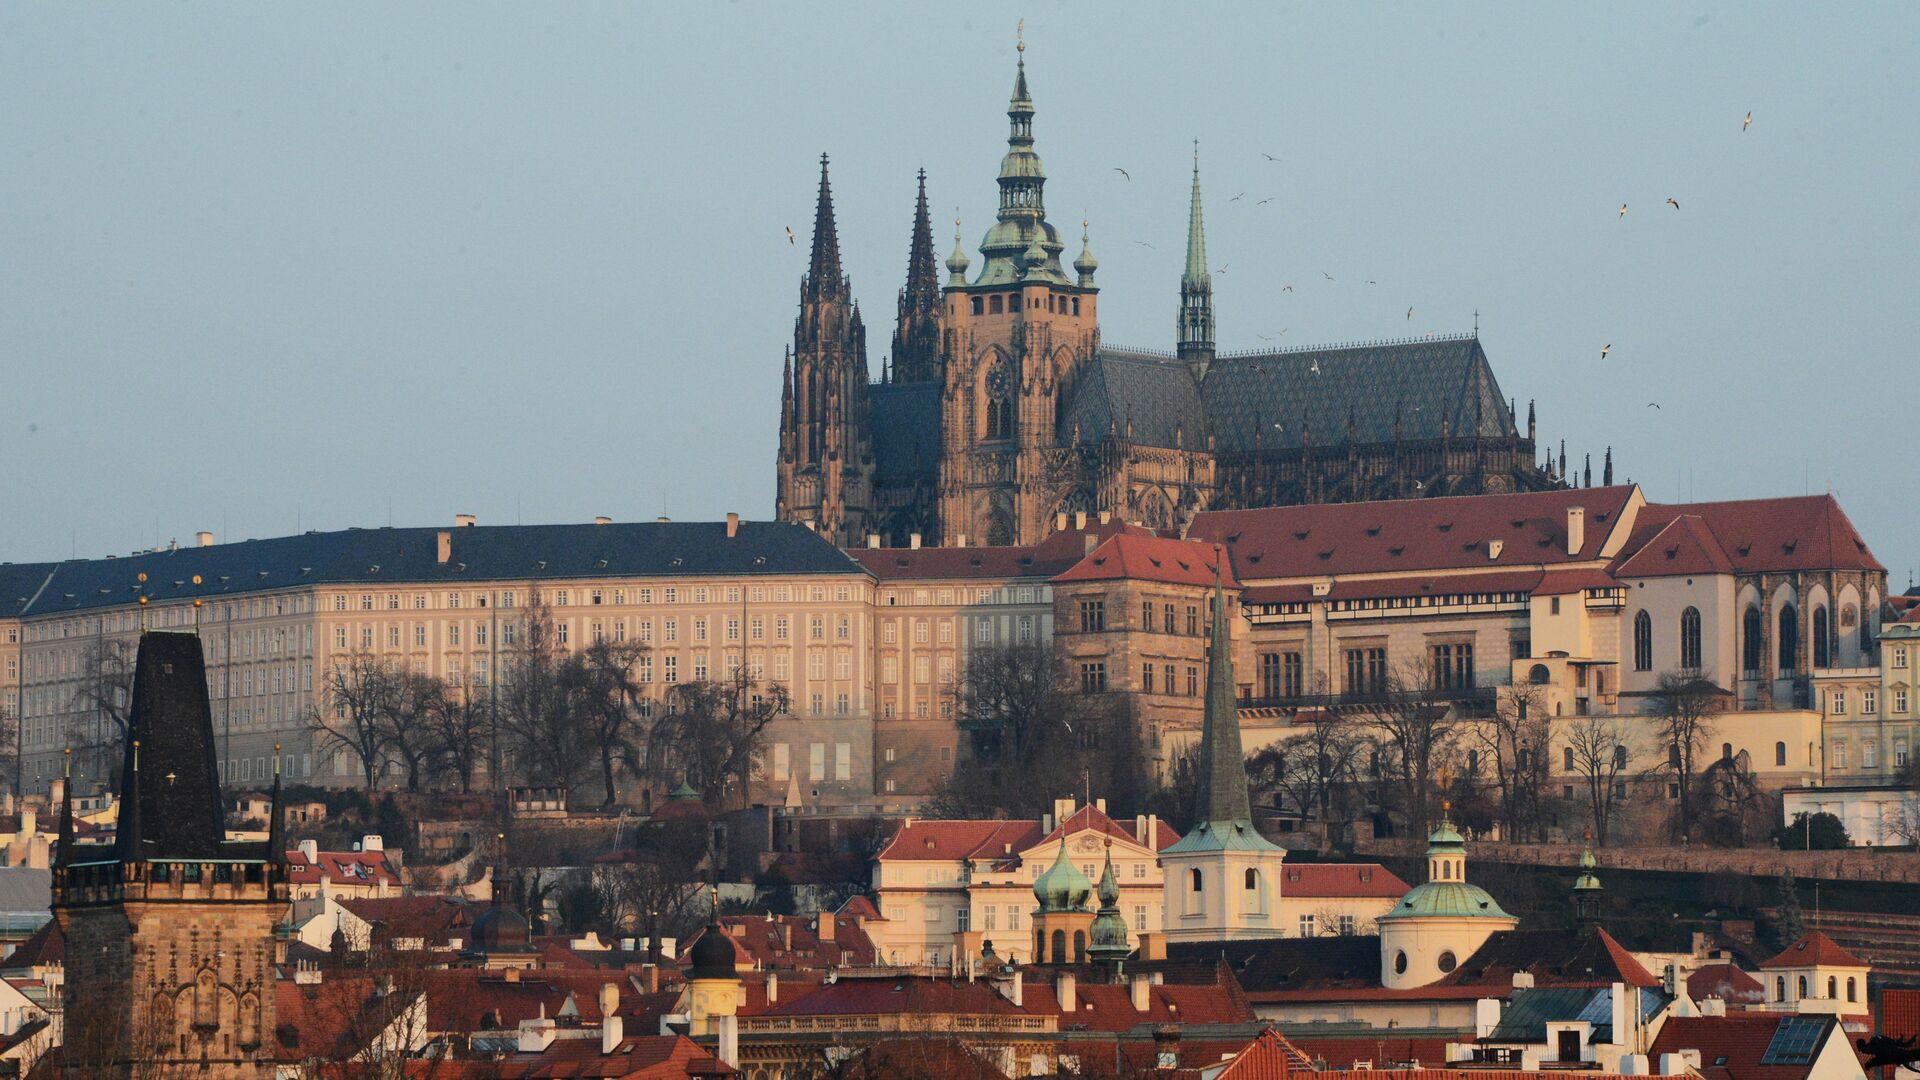 Pražský hrad - Sputnik Česká republika, 1920, 10.05.2021